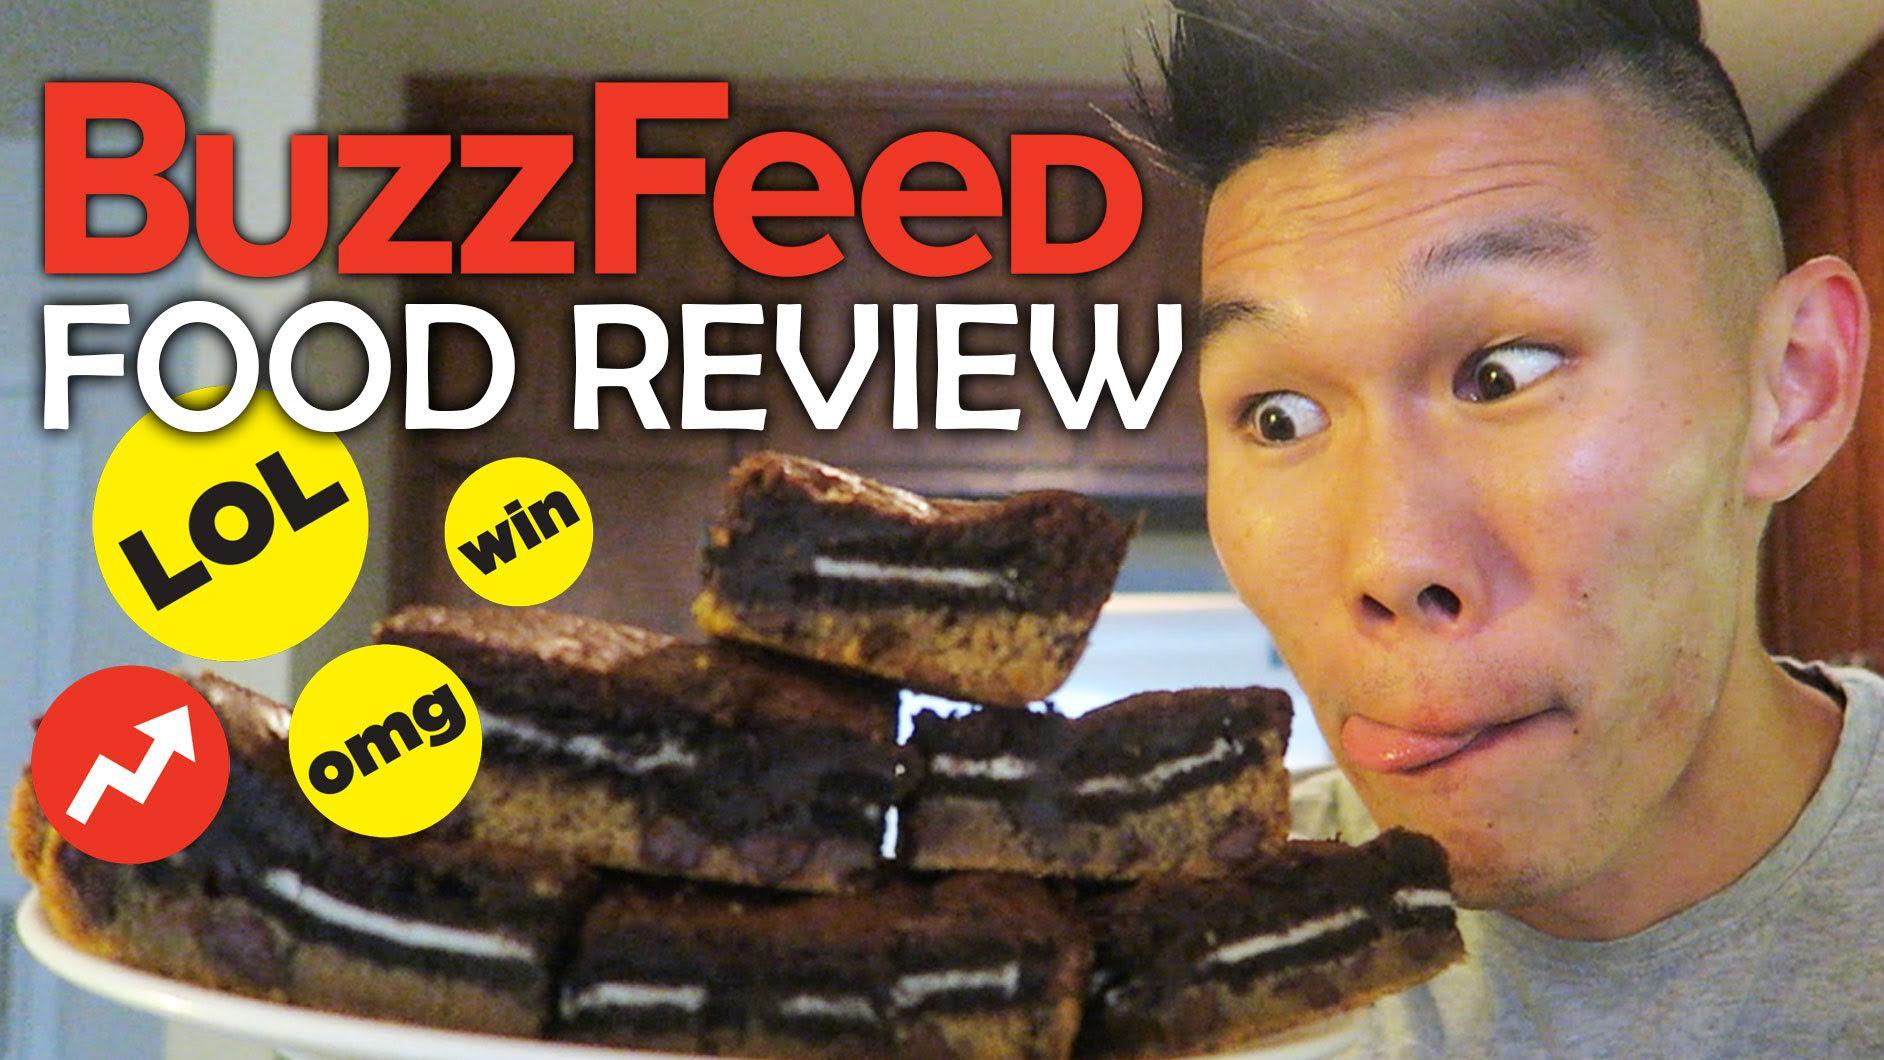 BUZZFEED FALL FOOD RECIPE TASTE TEST